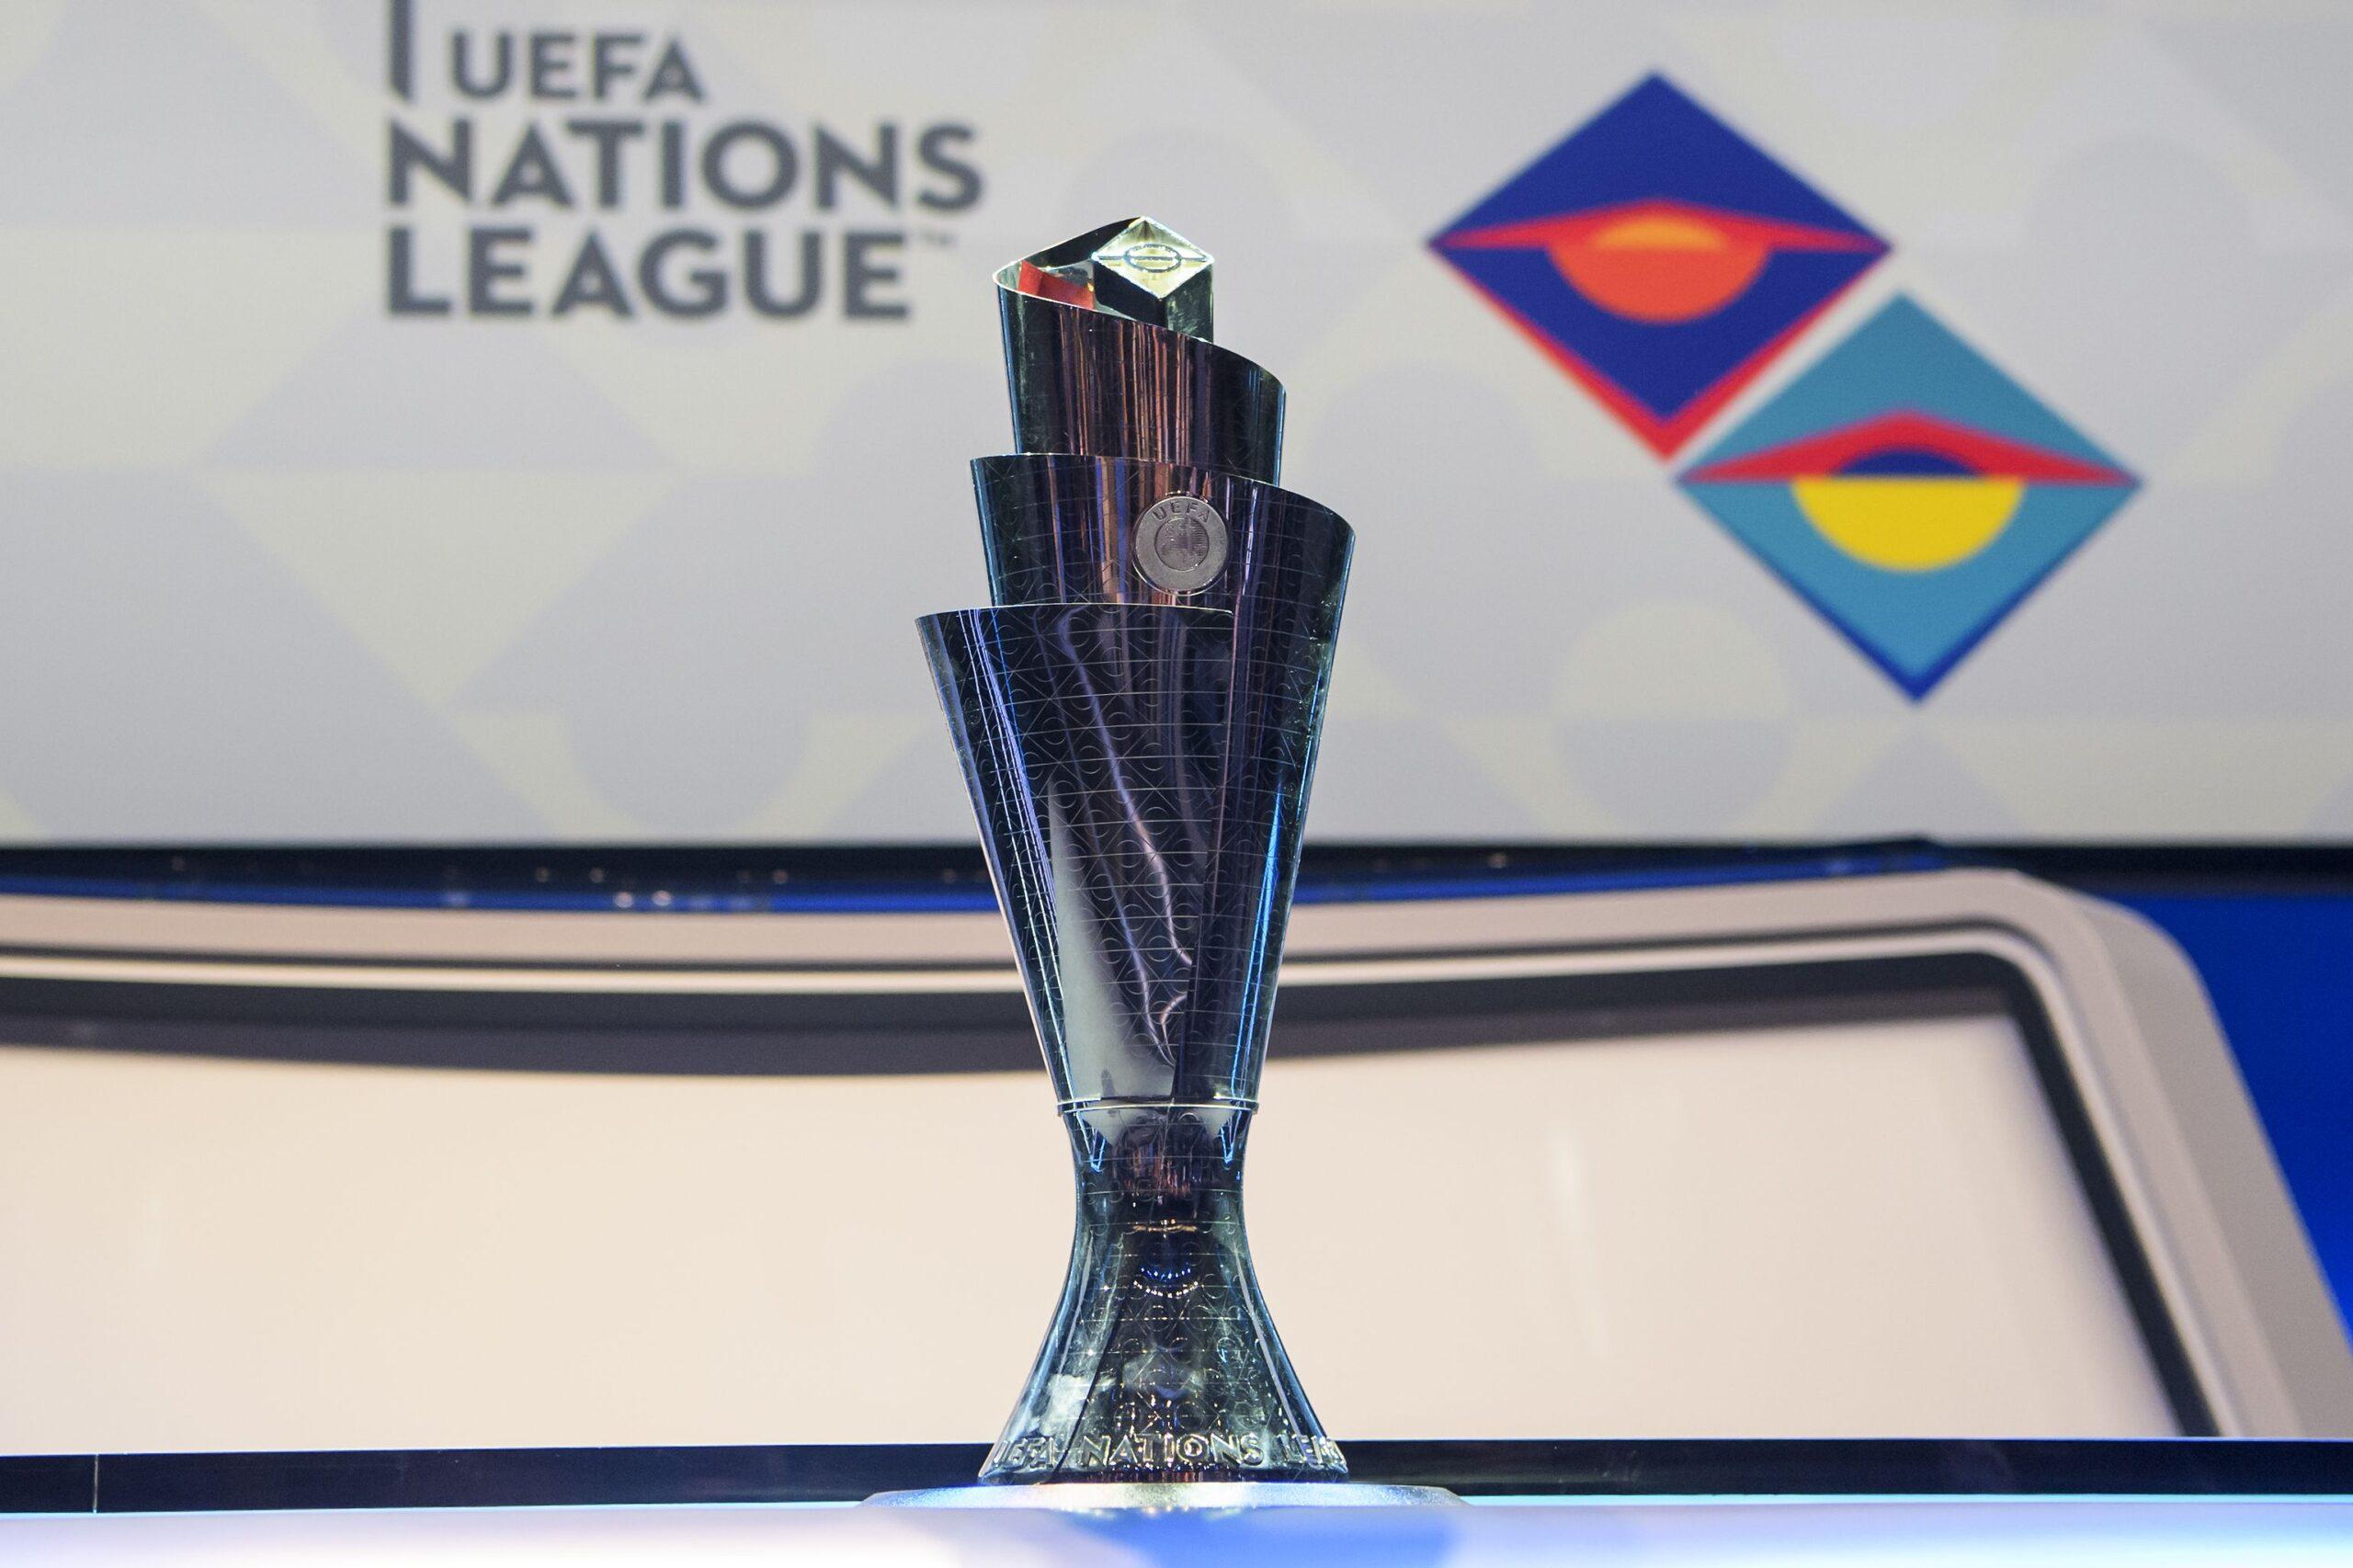 Armenia vs bulgaria betting tips sports betting public companies